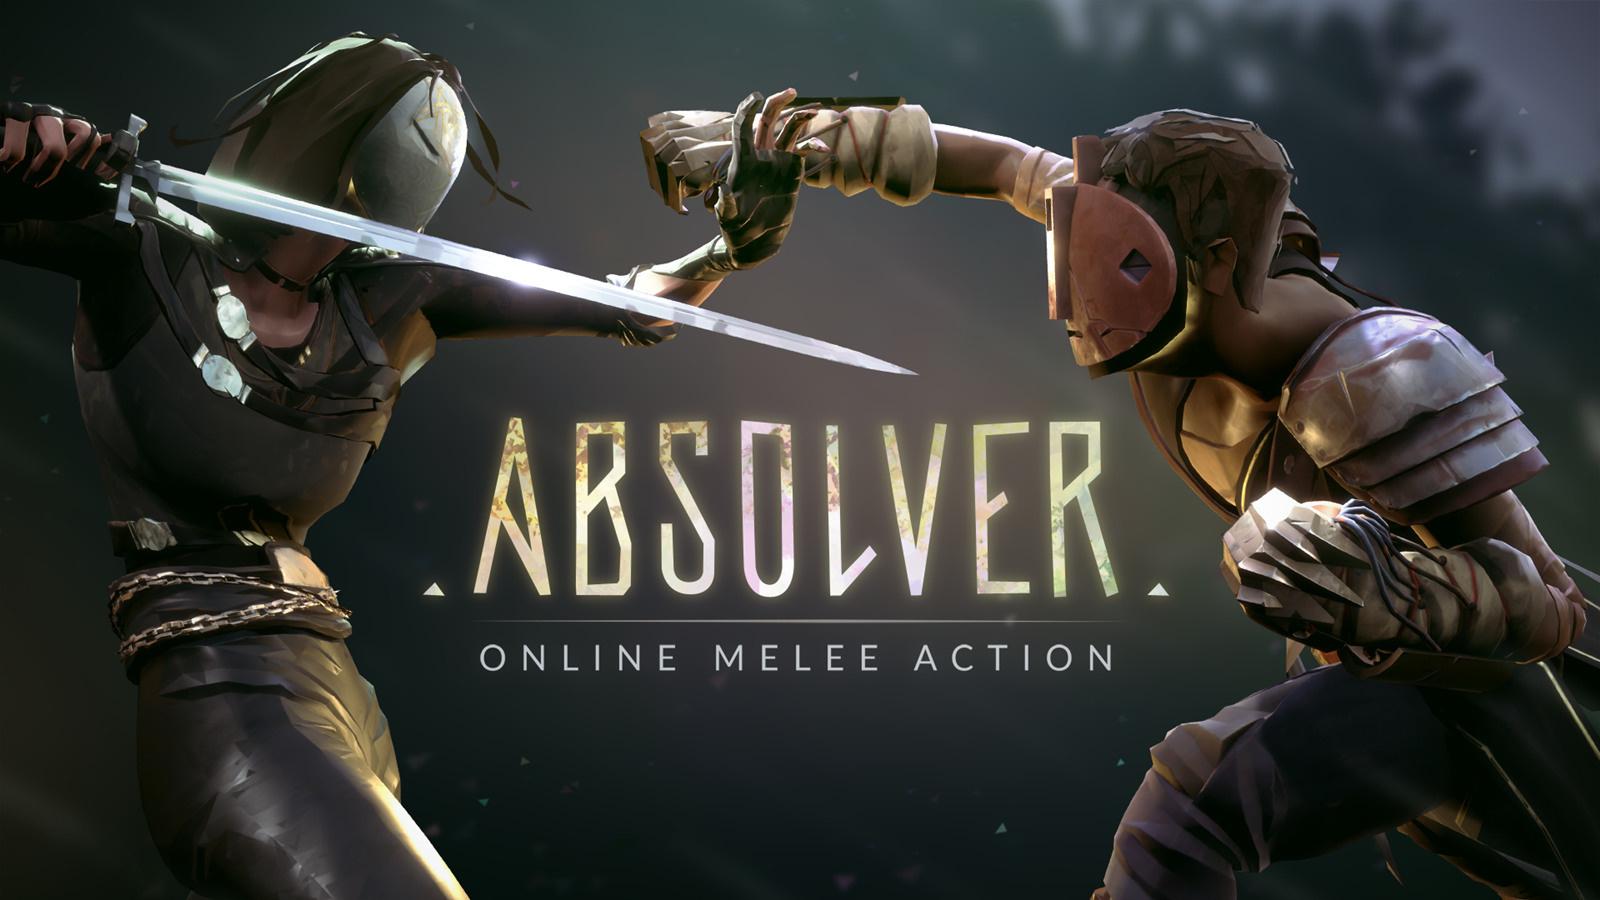 《Absolver》:一場極具實驗性的聯線格鬥體驗